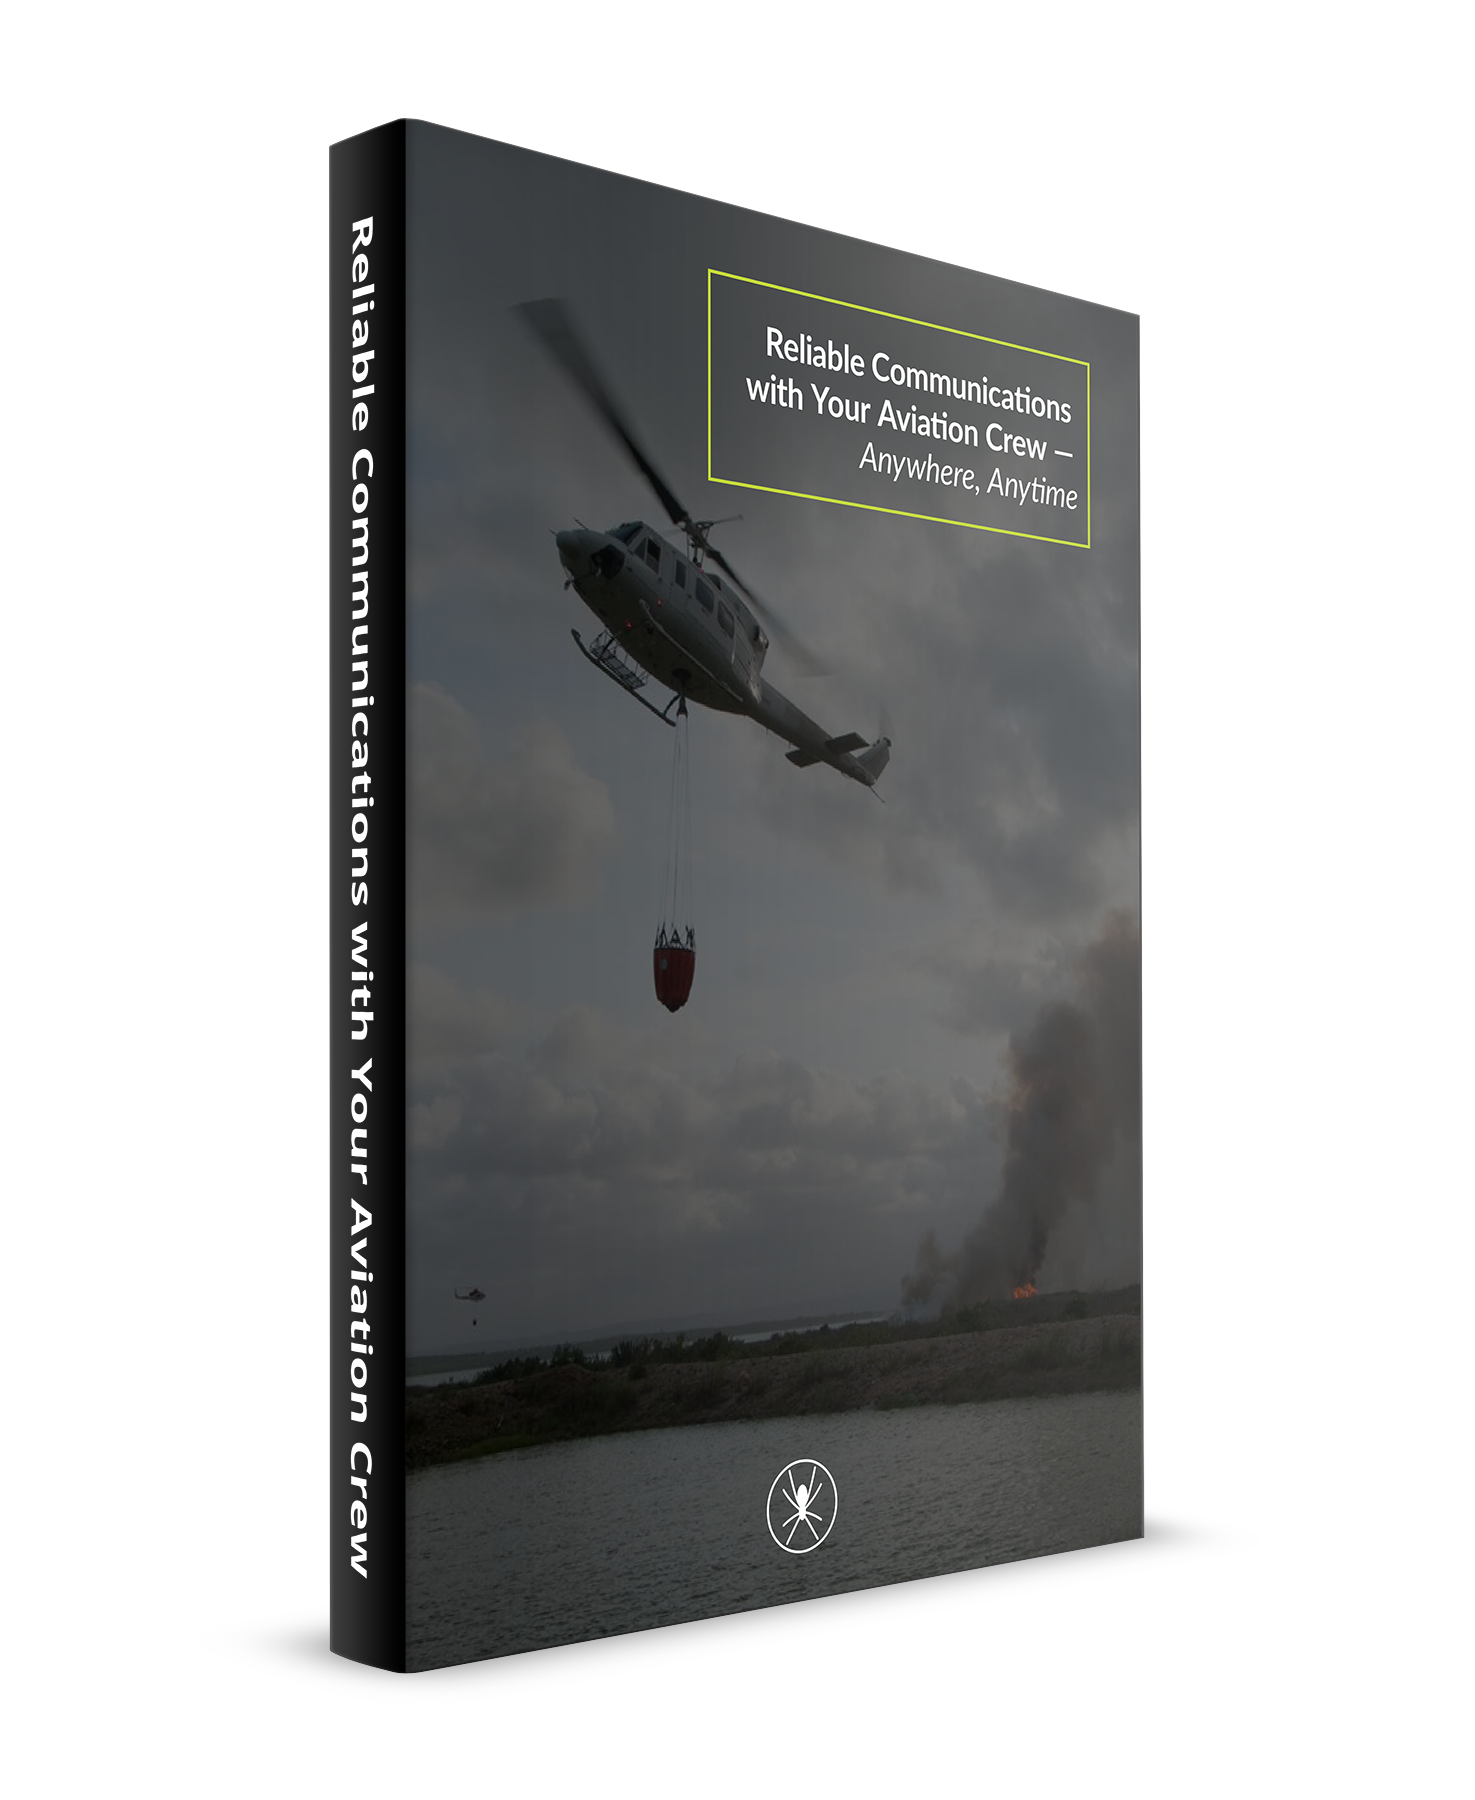 Spidertracks Comms_eBook 3D cover.png